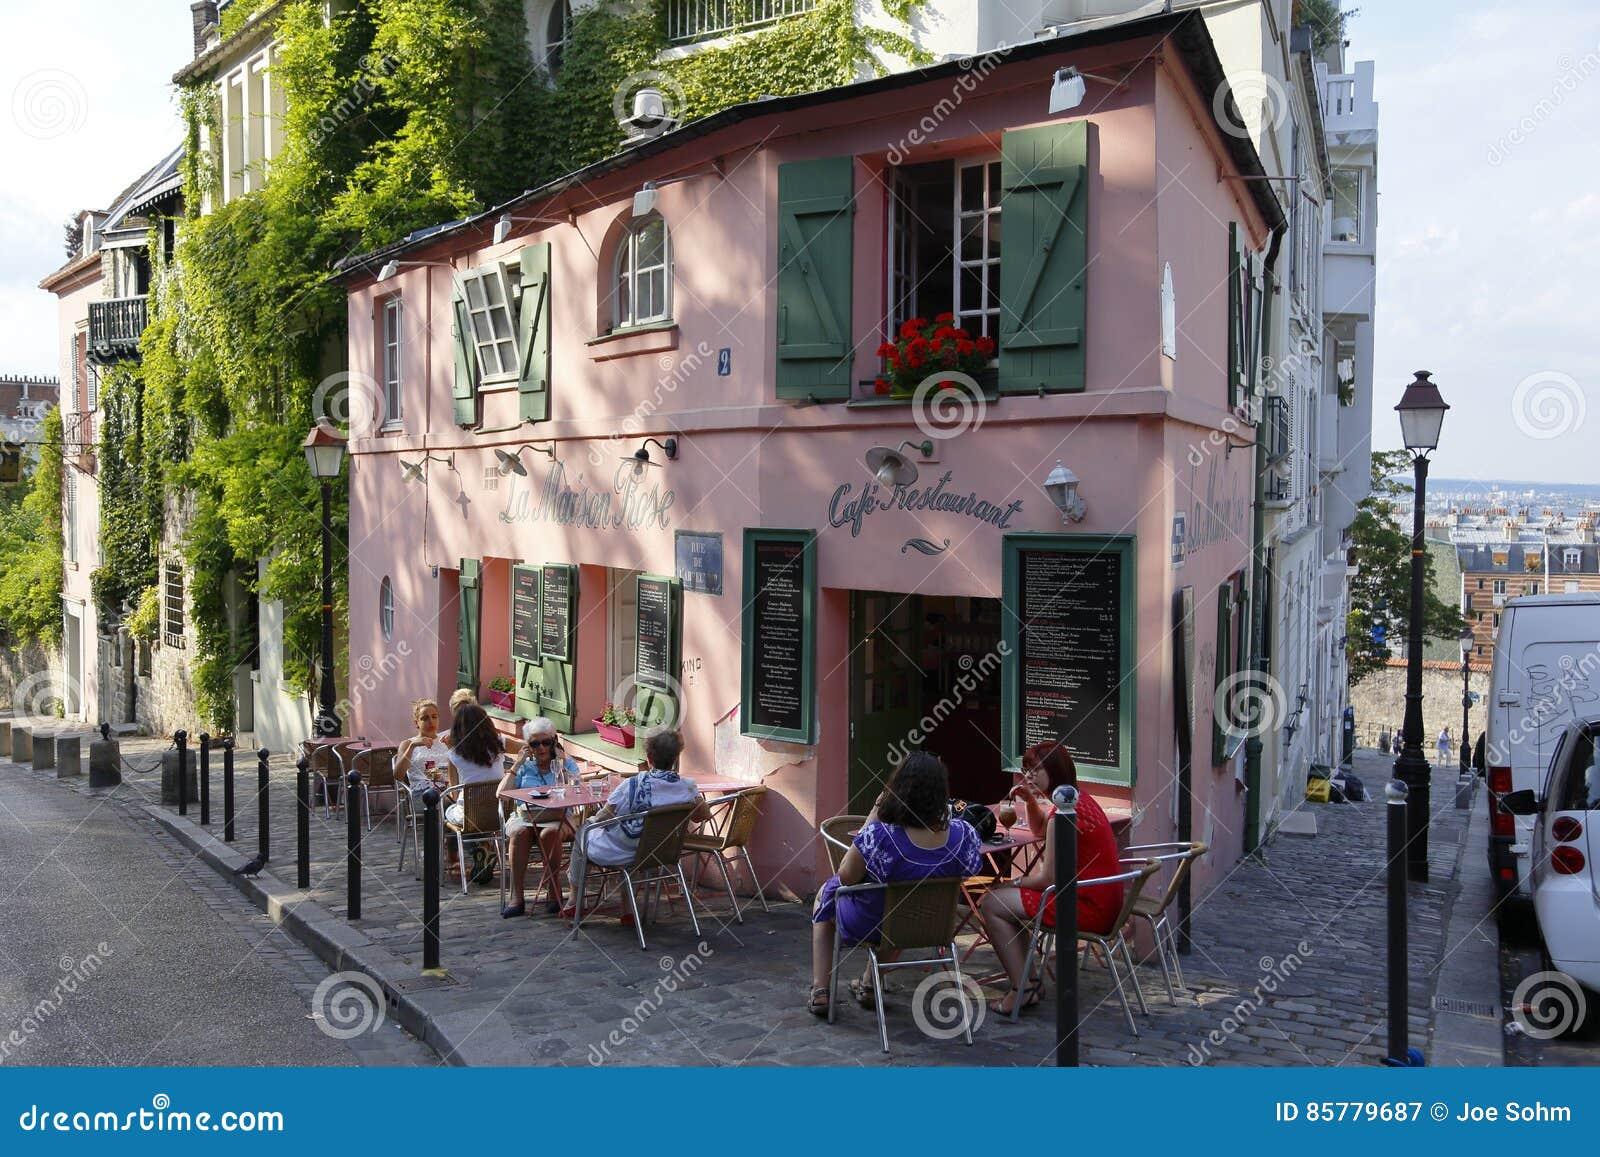 Europe france paris montmartre la maison rose french cafe rue de labreuvoir people walking on street and car parked on streetside august 2015